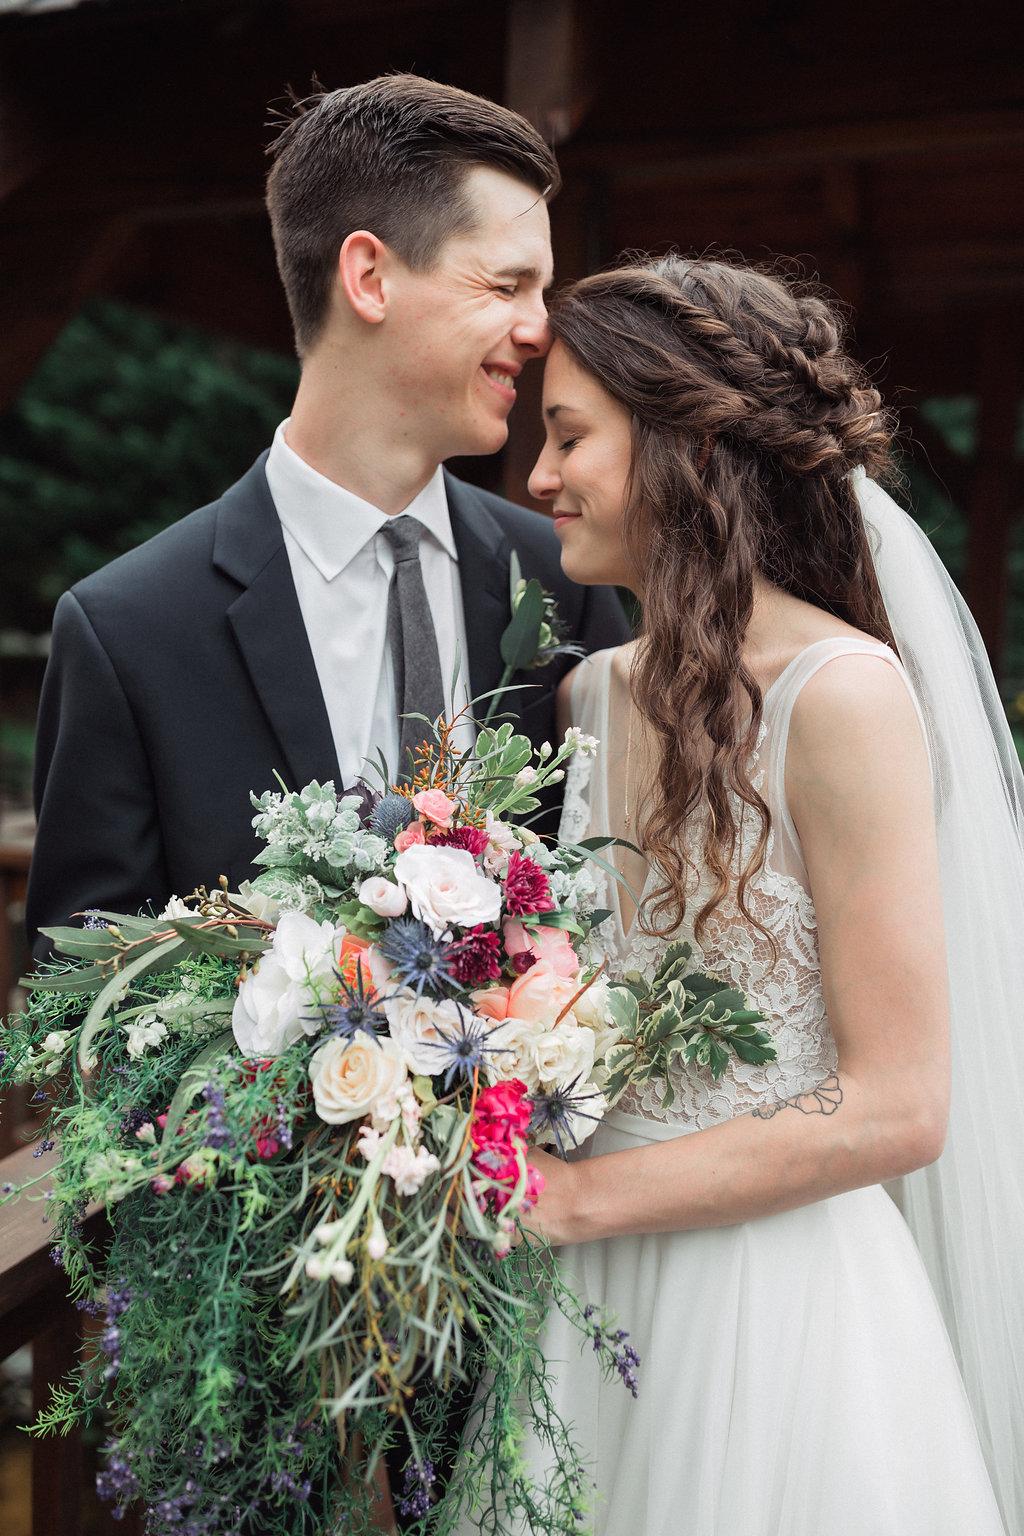 Honeysuckle-Hill-Weddings-Mallory-Patrick-66.jpg